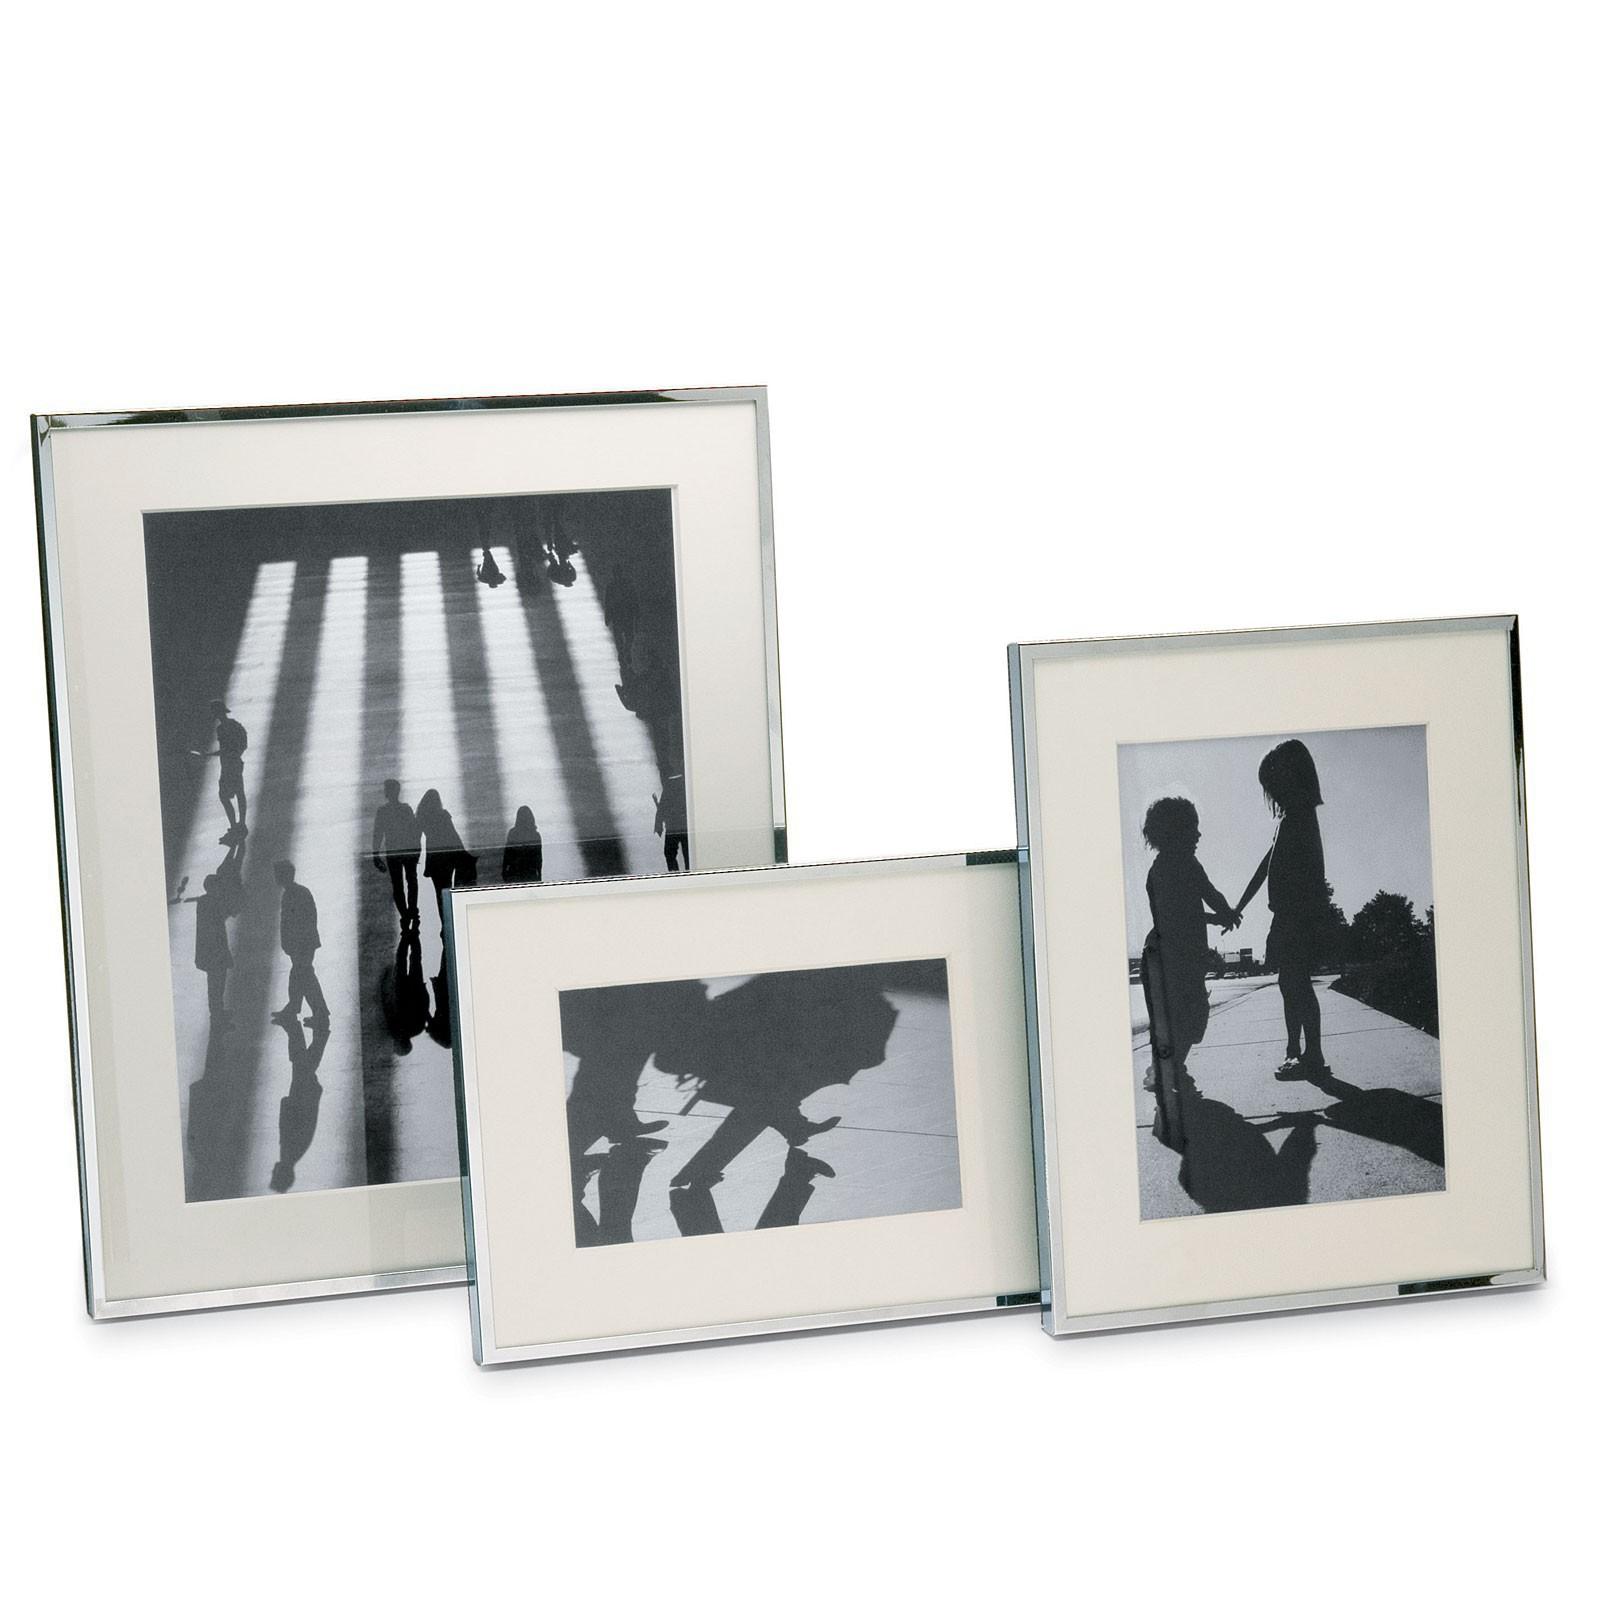 Bilderrahmen Chrom mit Passepartout 20 x 25 cm Philippi SHADOW